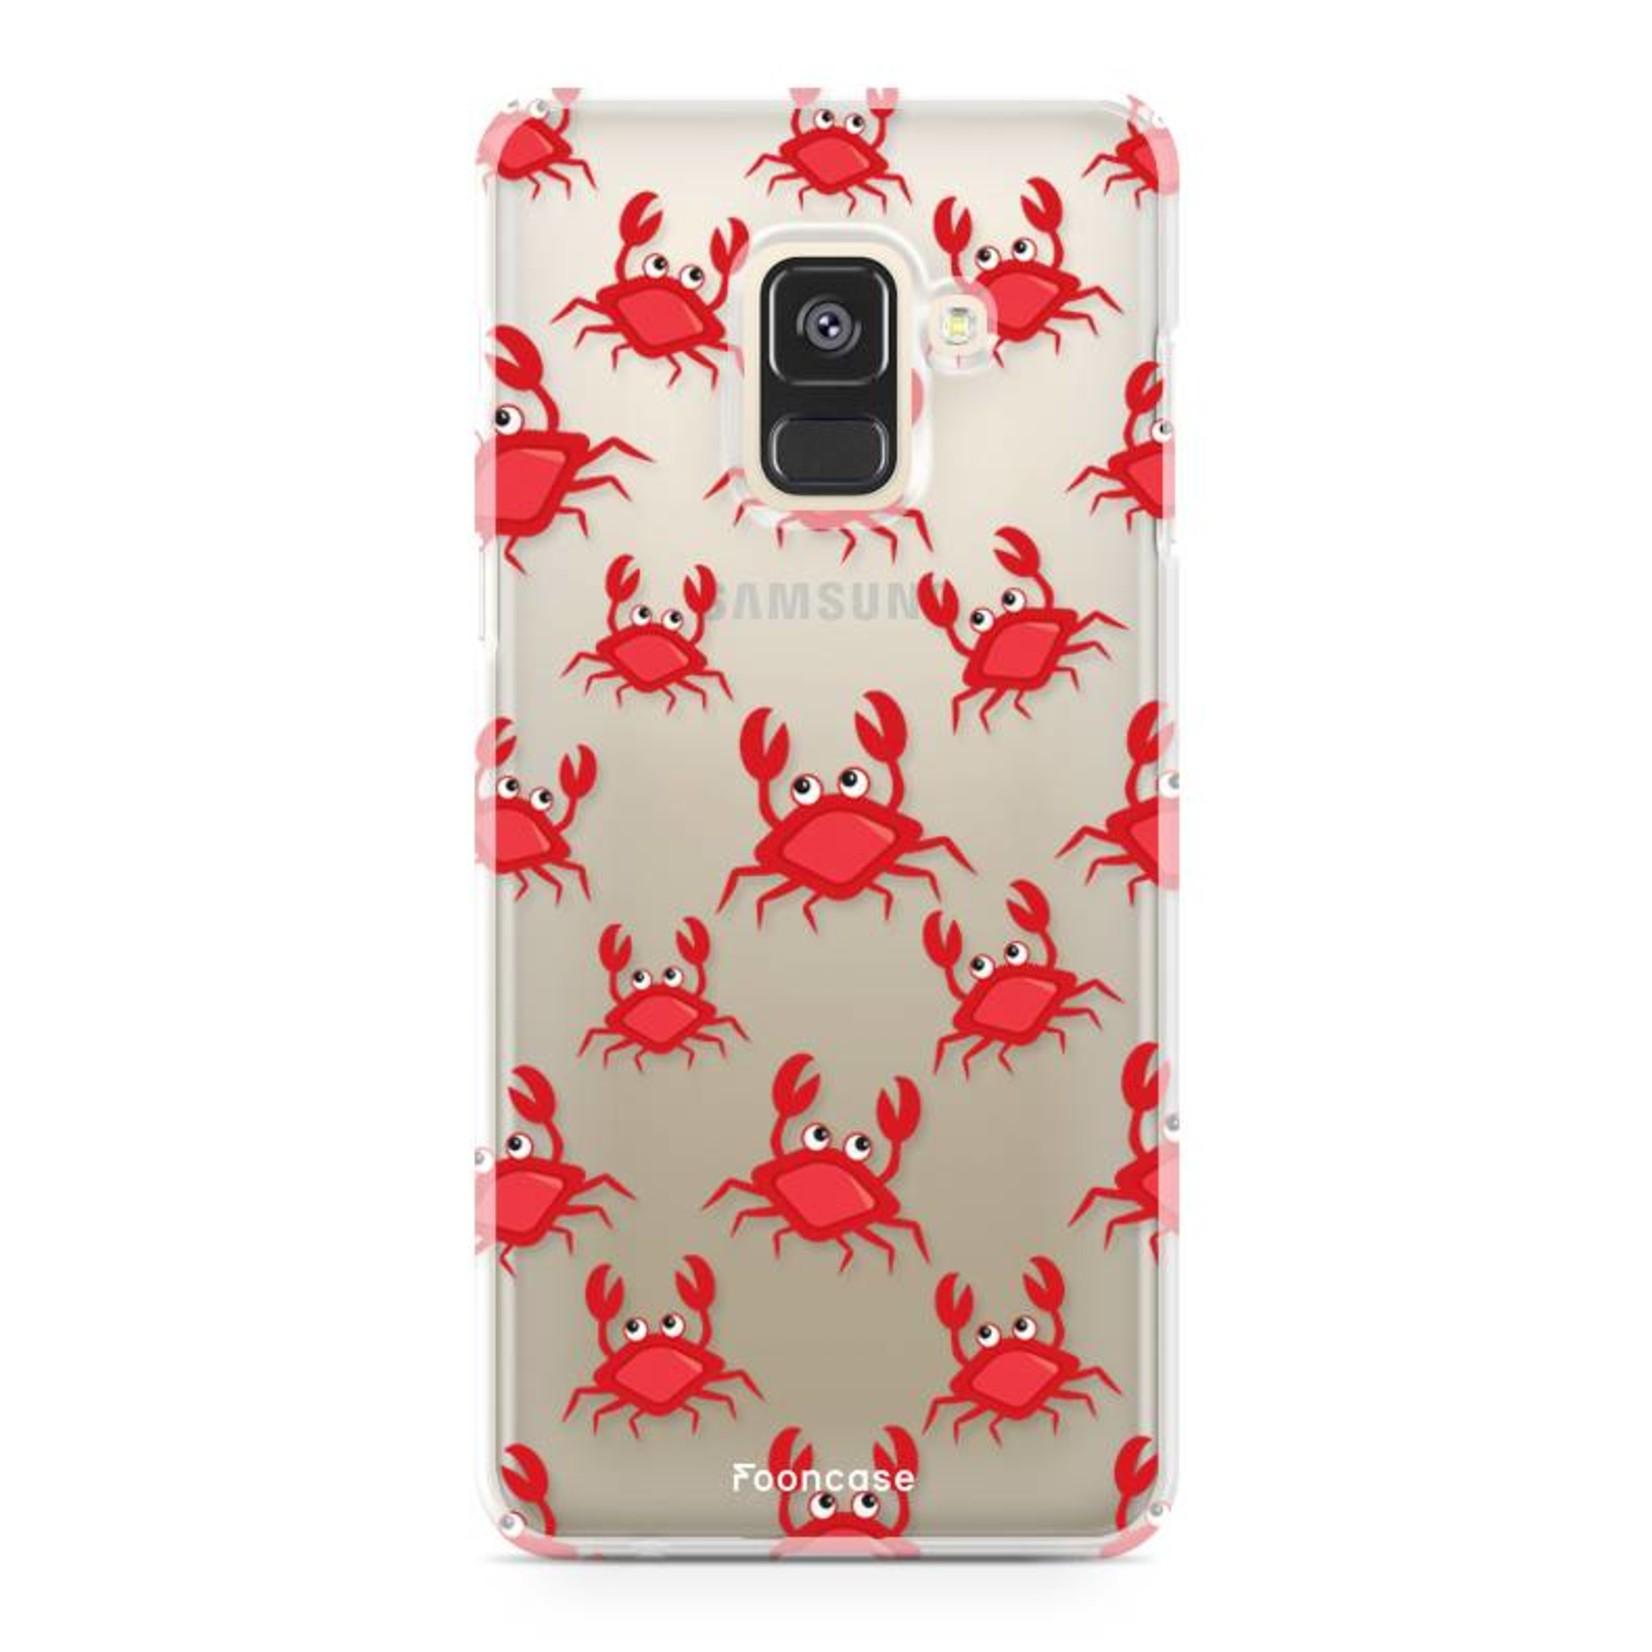 FOONCASE Samsung Galaxy A8 2018 hoesje TPU Soft Case - Back Cover - Crabs / Krabbetjes / Krabben